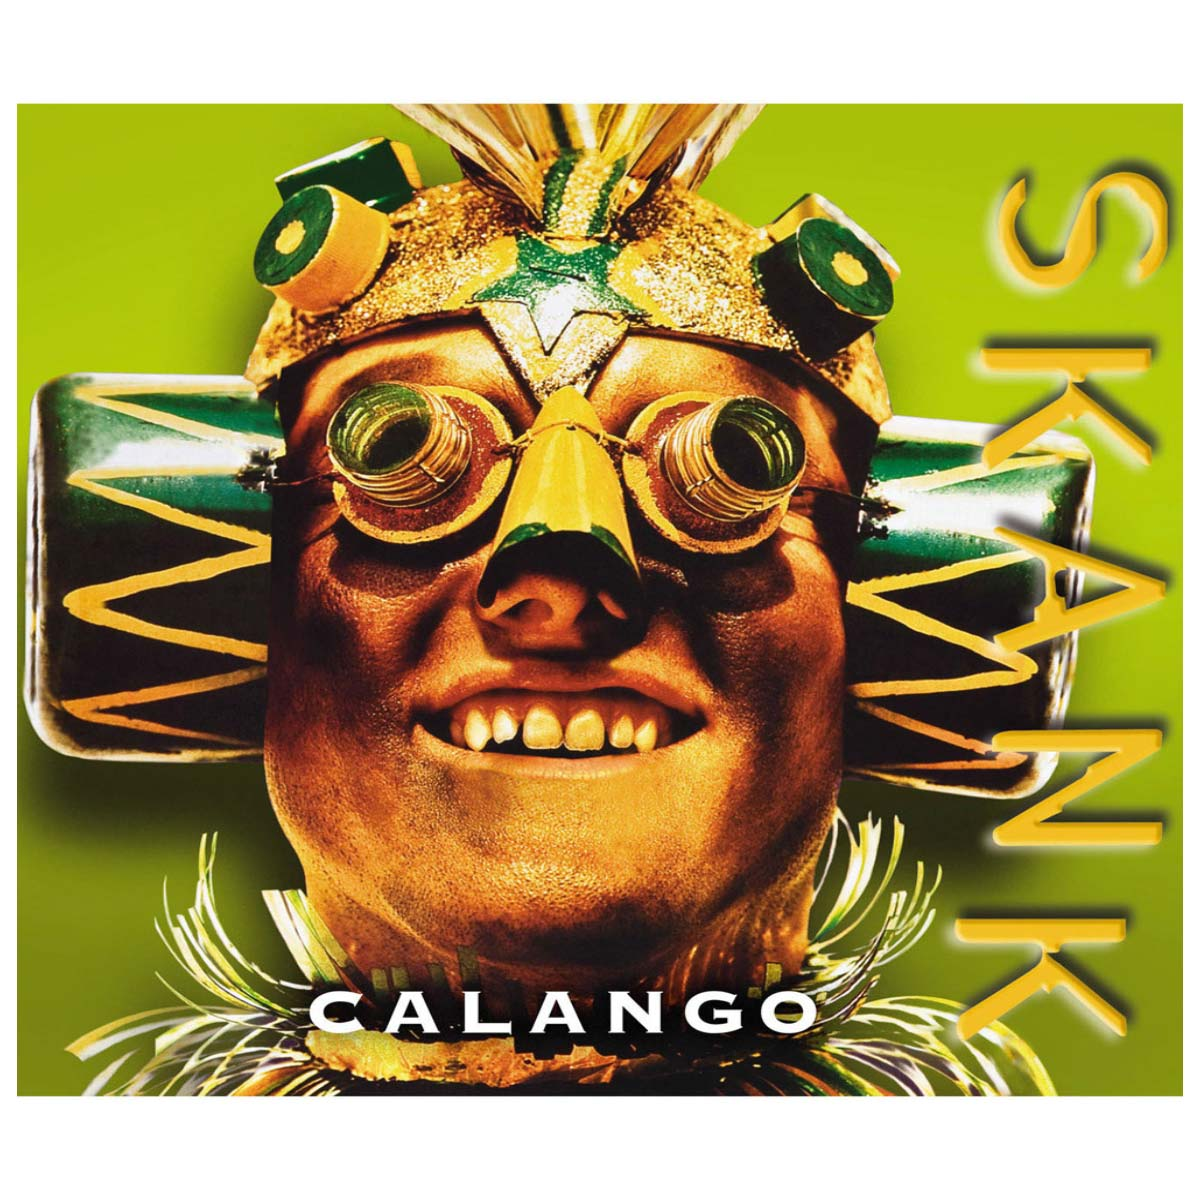 LP Skank Calango